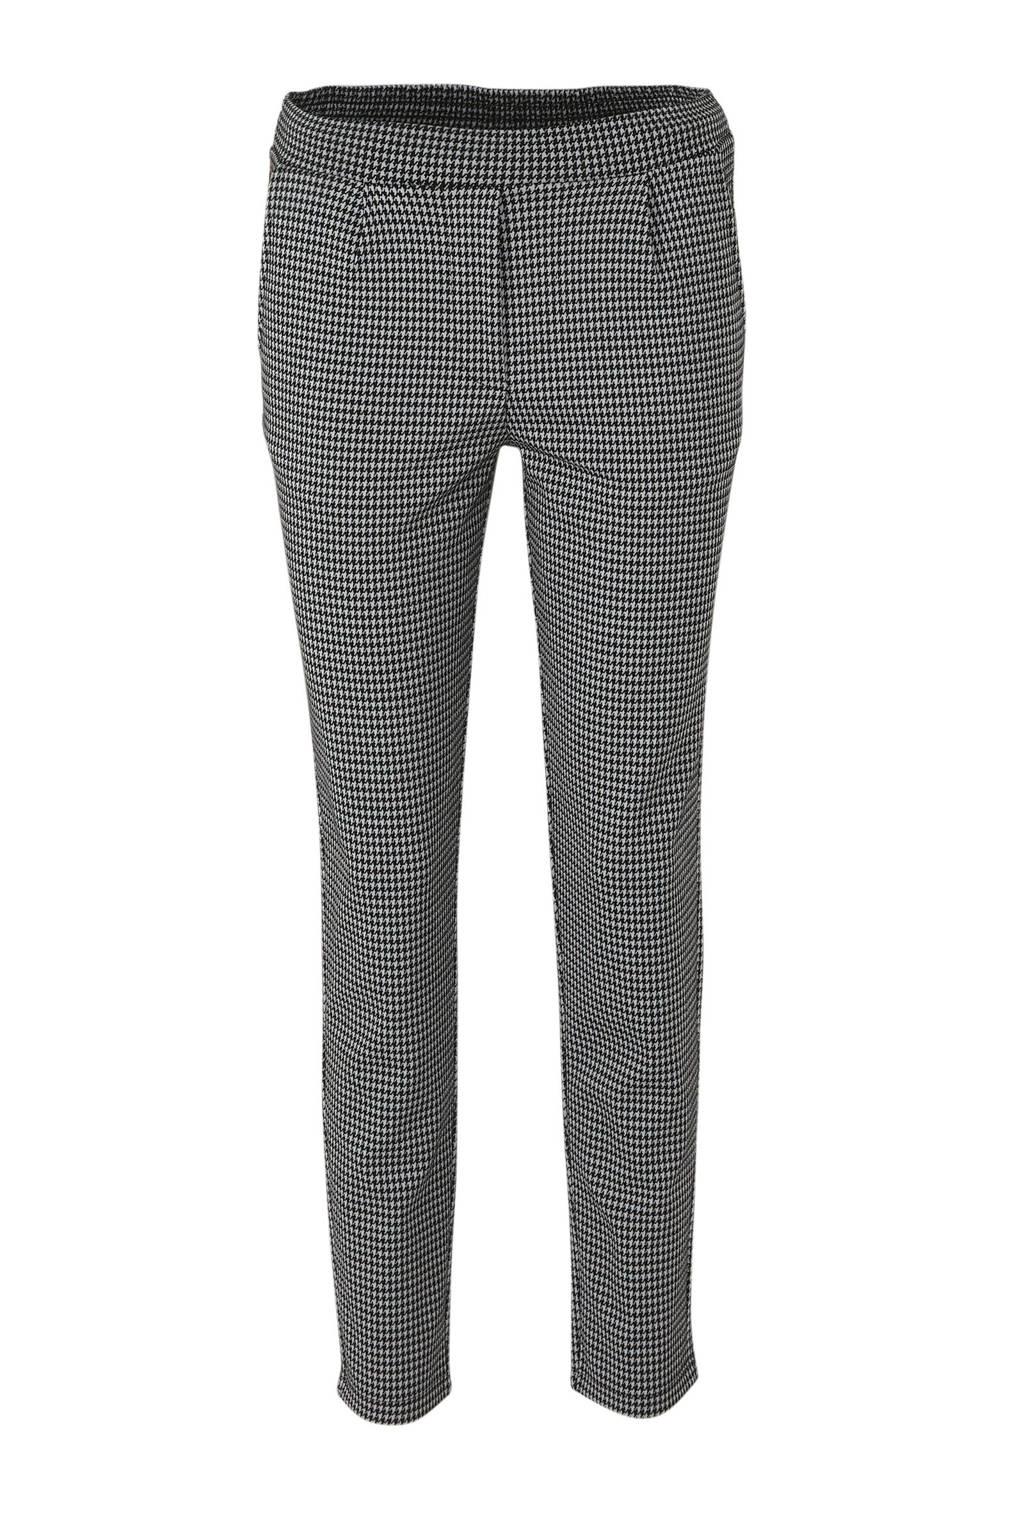 JACQUELINE DE YONG slim fit broek met all over print donkerood multi, Zwart/wit